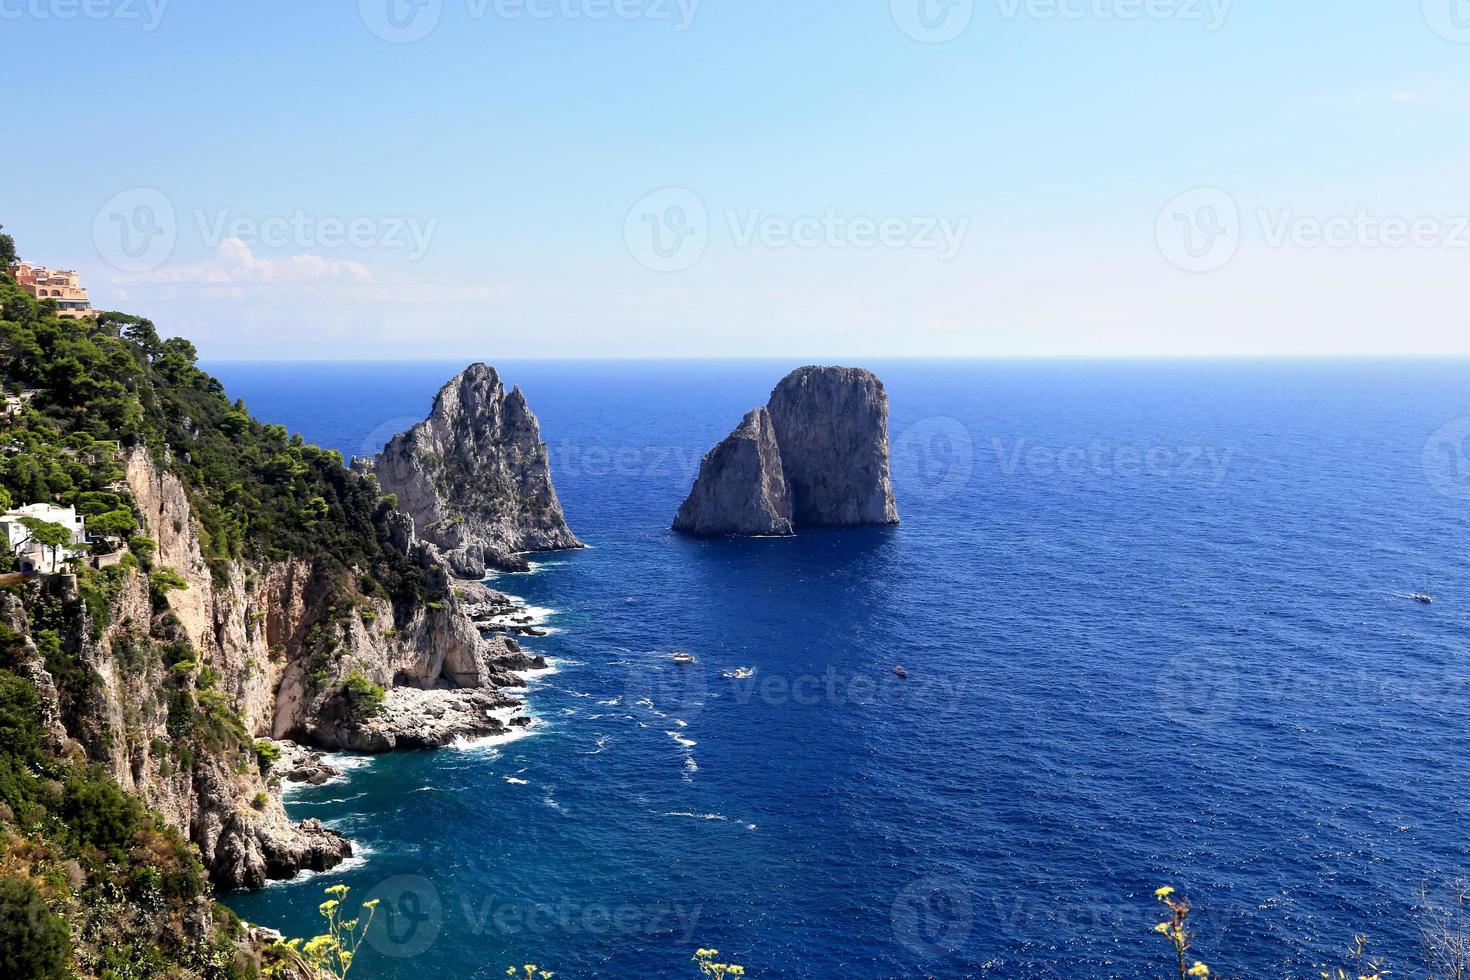 wunderschöne Landschaft der berühmten Faraglioni Felsen auf Capri Insel, Italien. foto